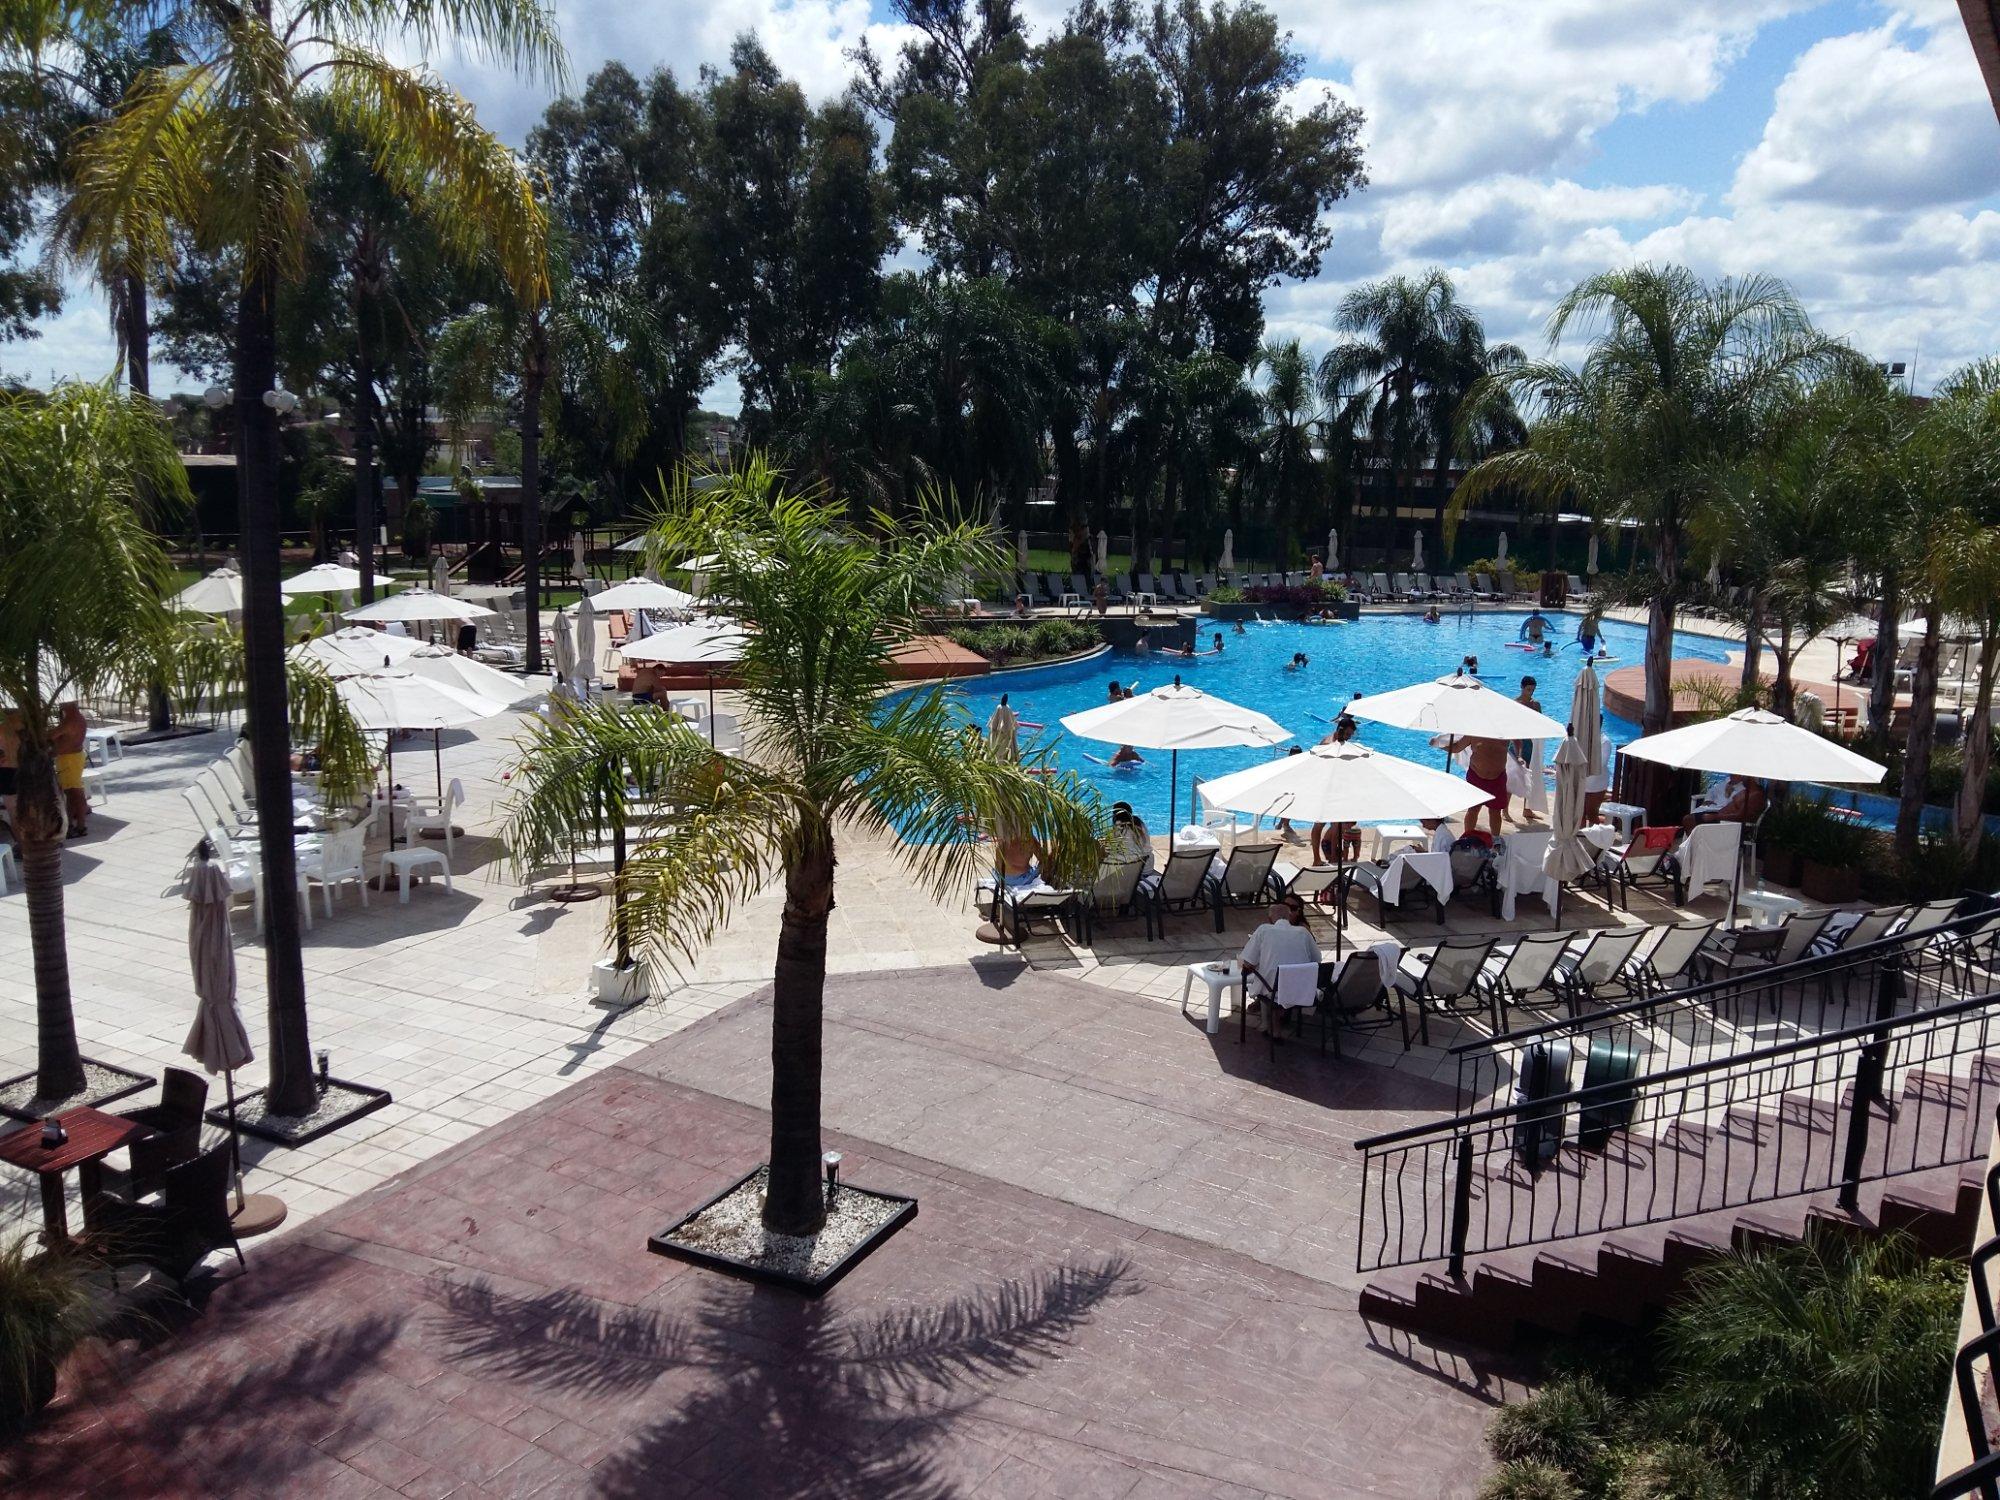 Los Pinos Resort & Spa Termal